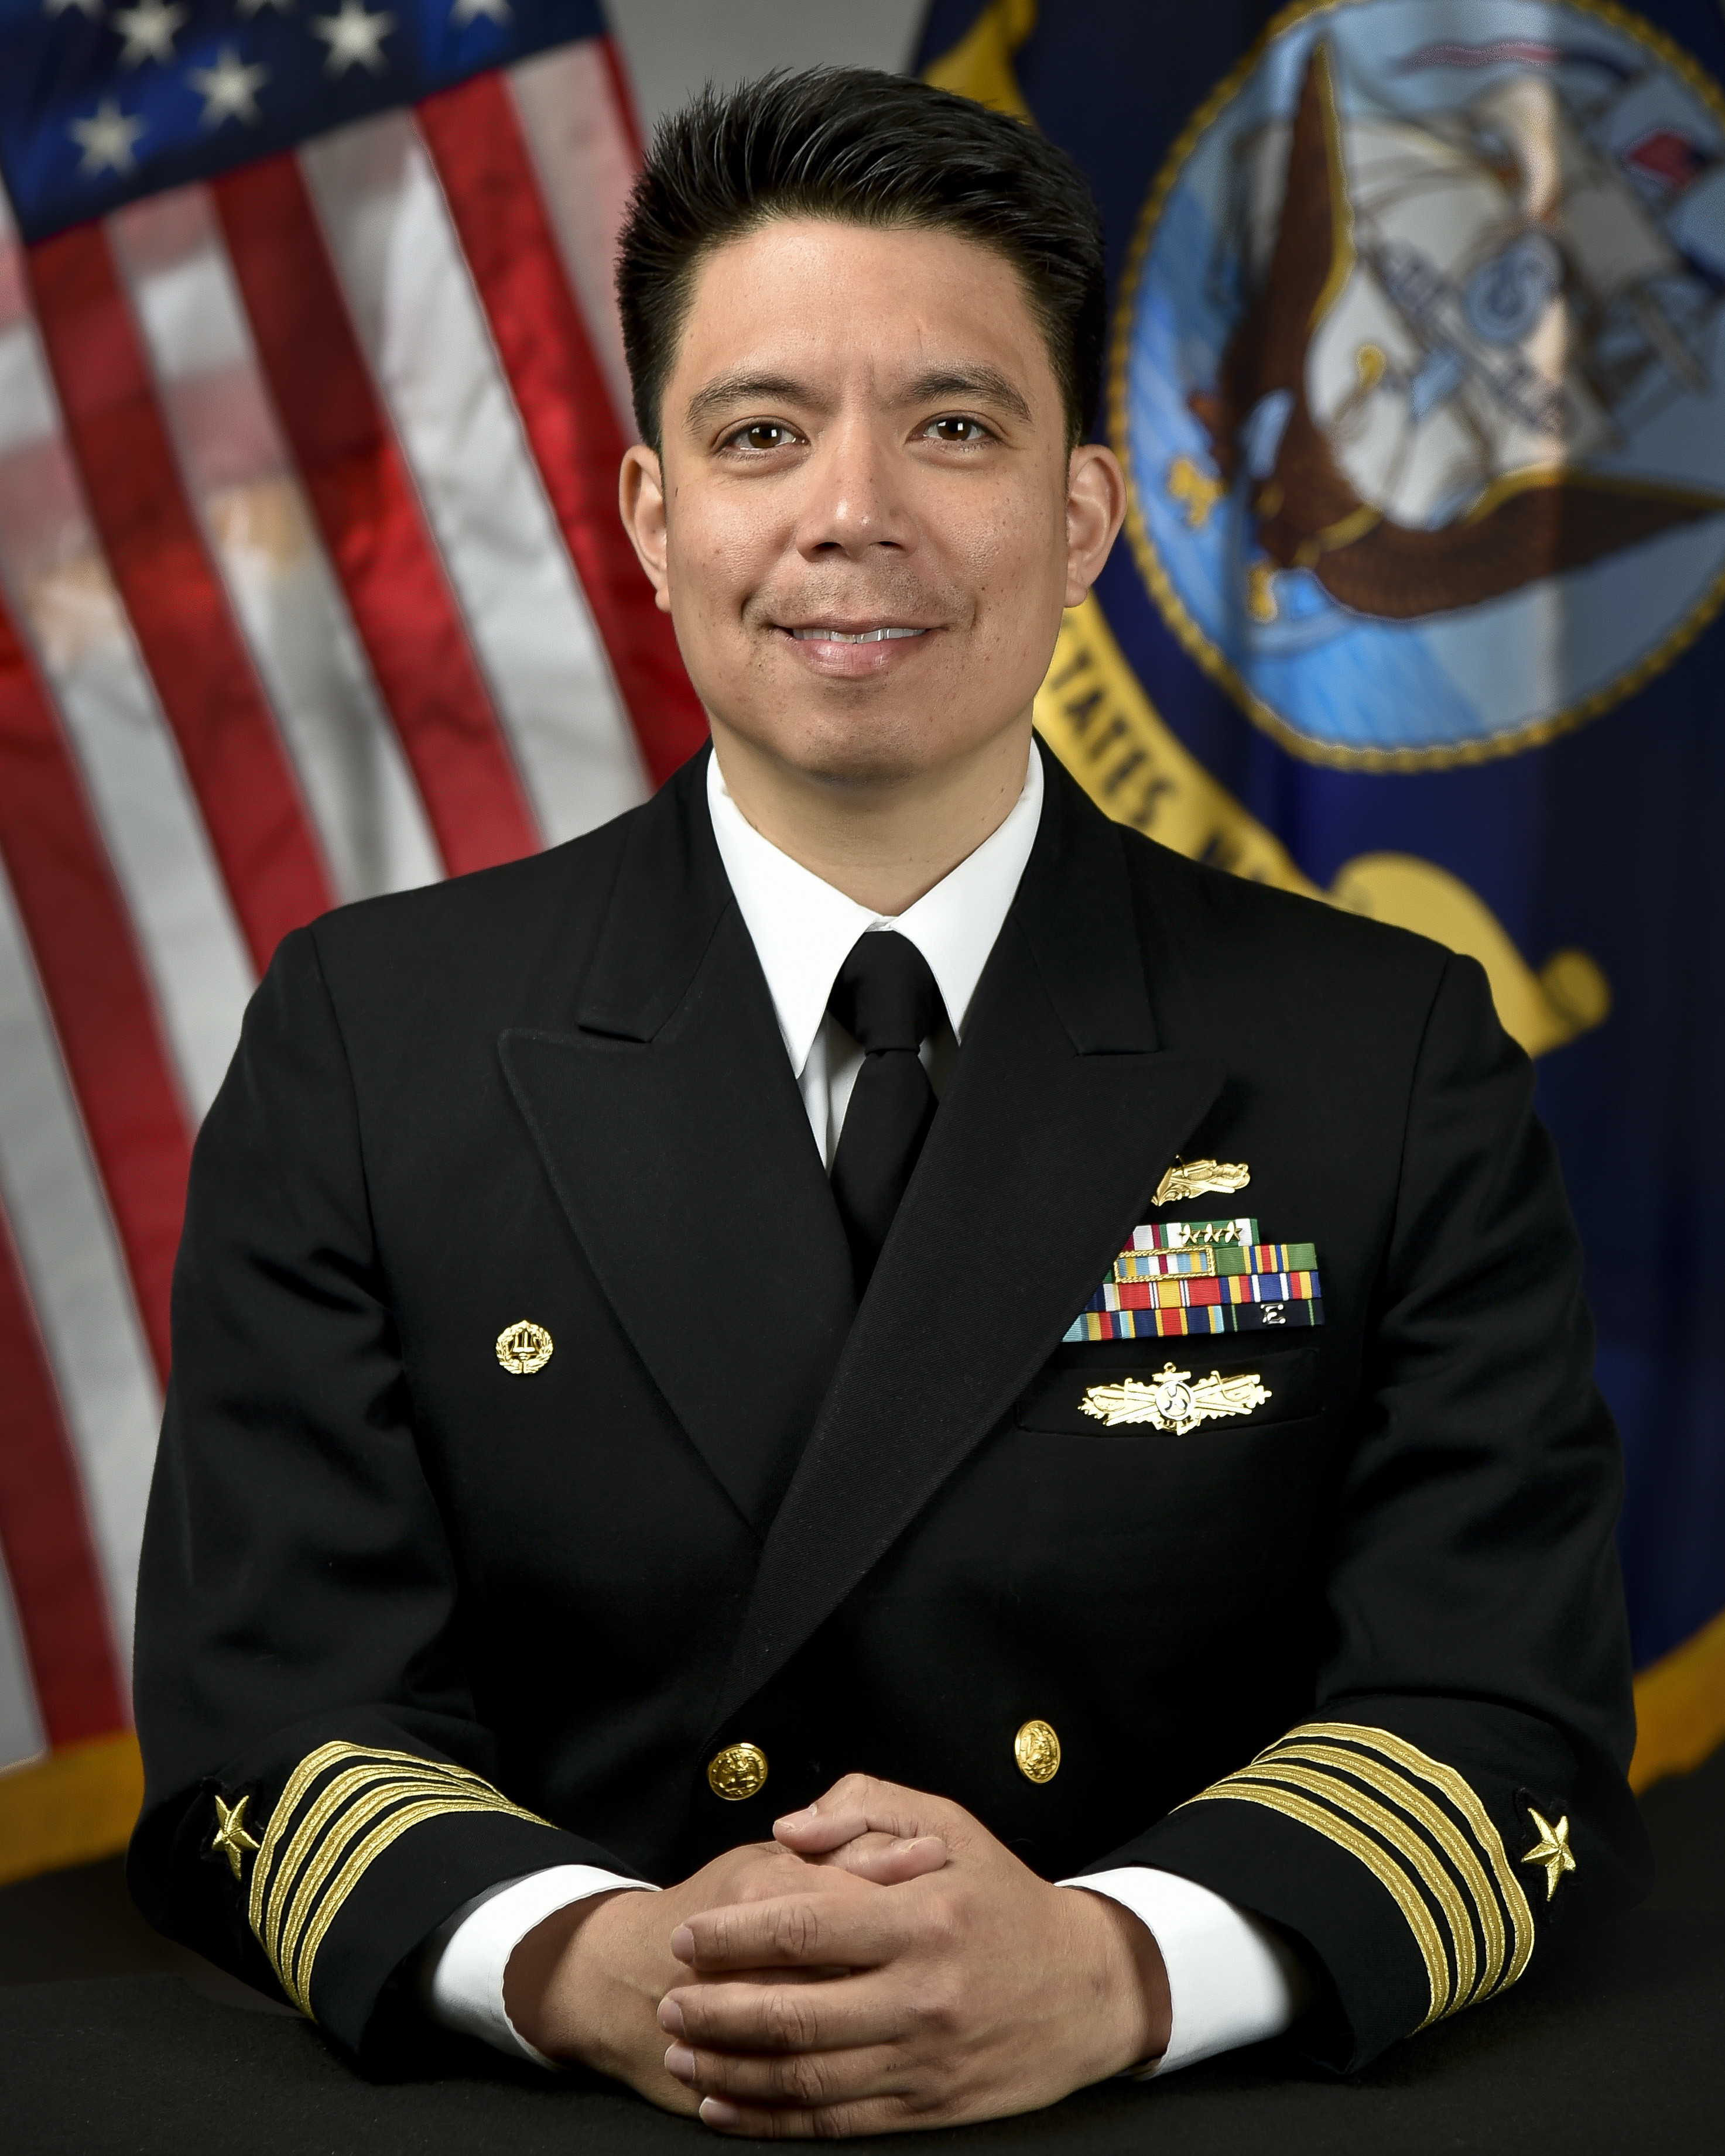 Capt. Ricardo Vigil